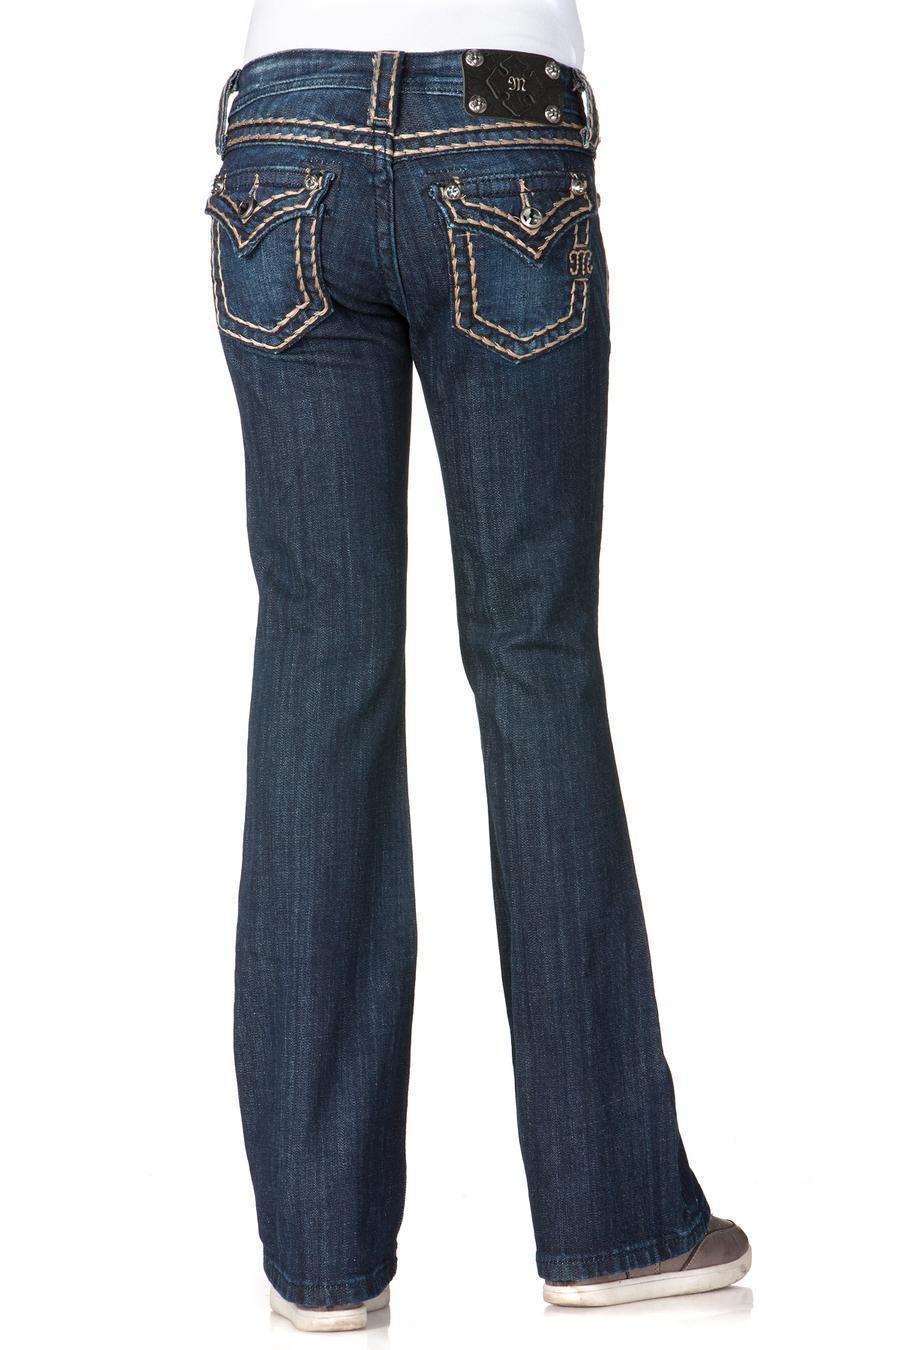 Girls Saddle Stitch Border Boot Cut Jeans by missme